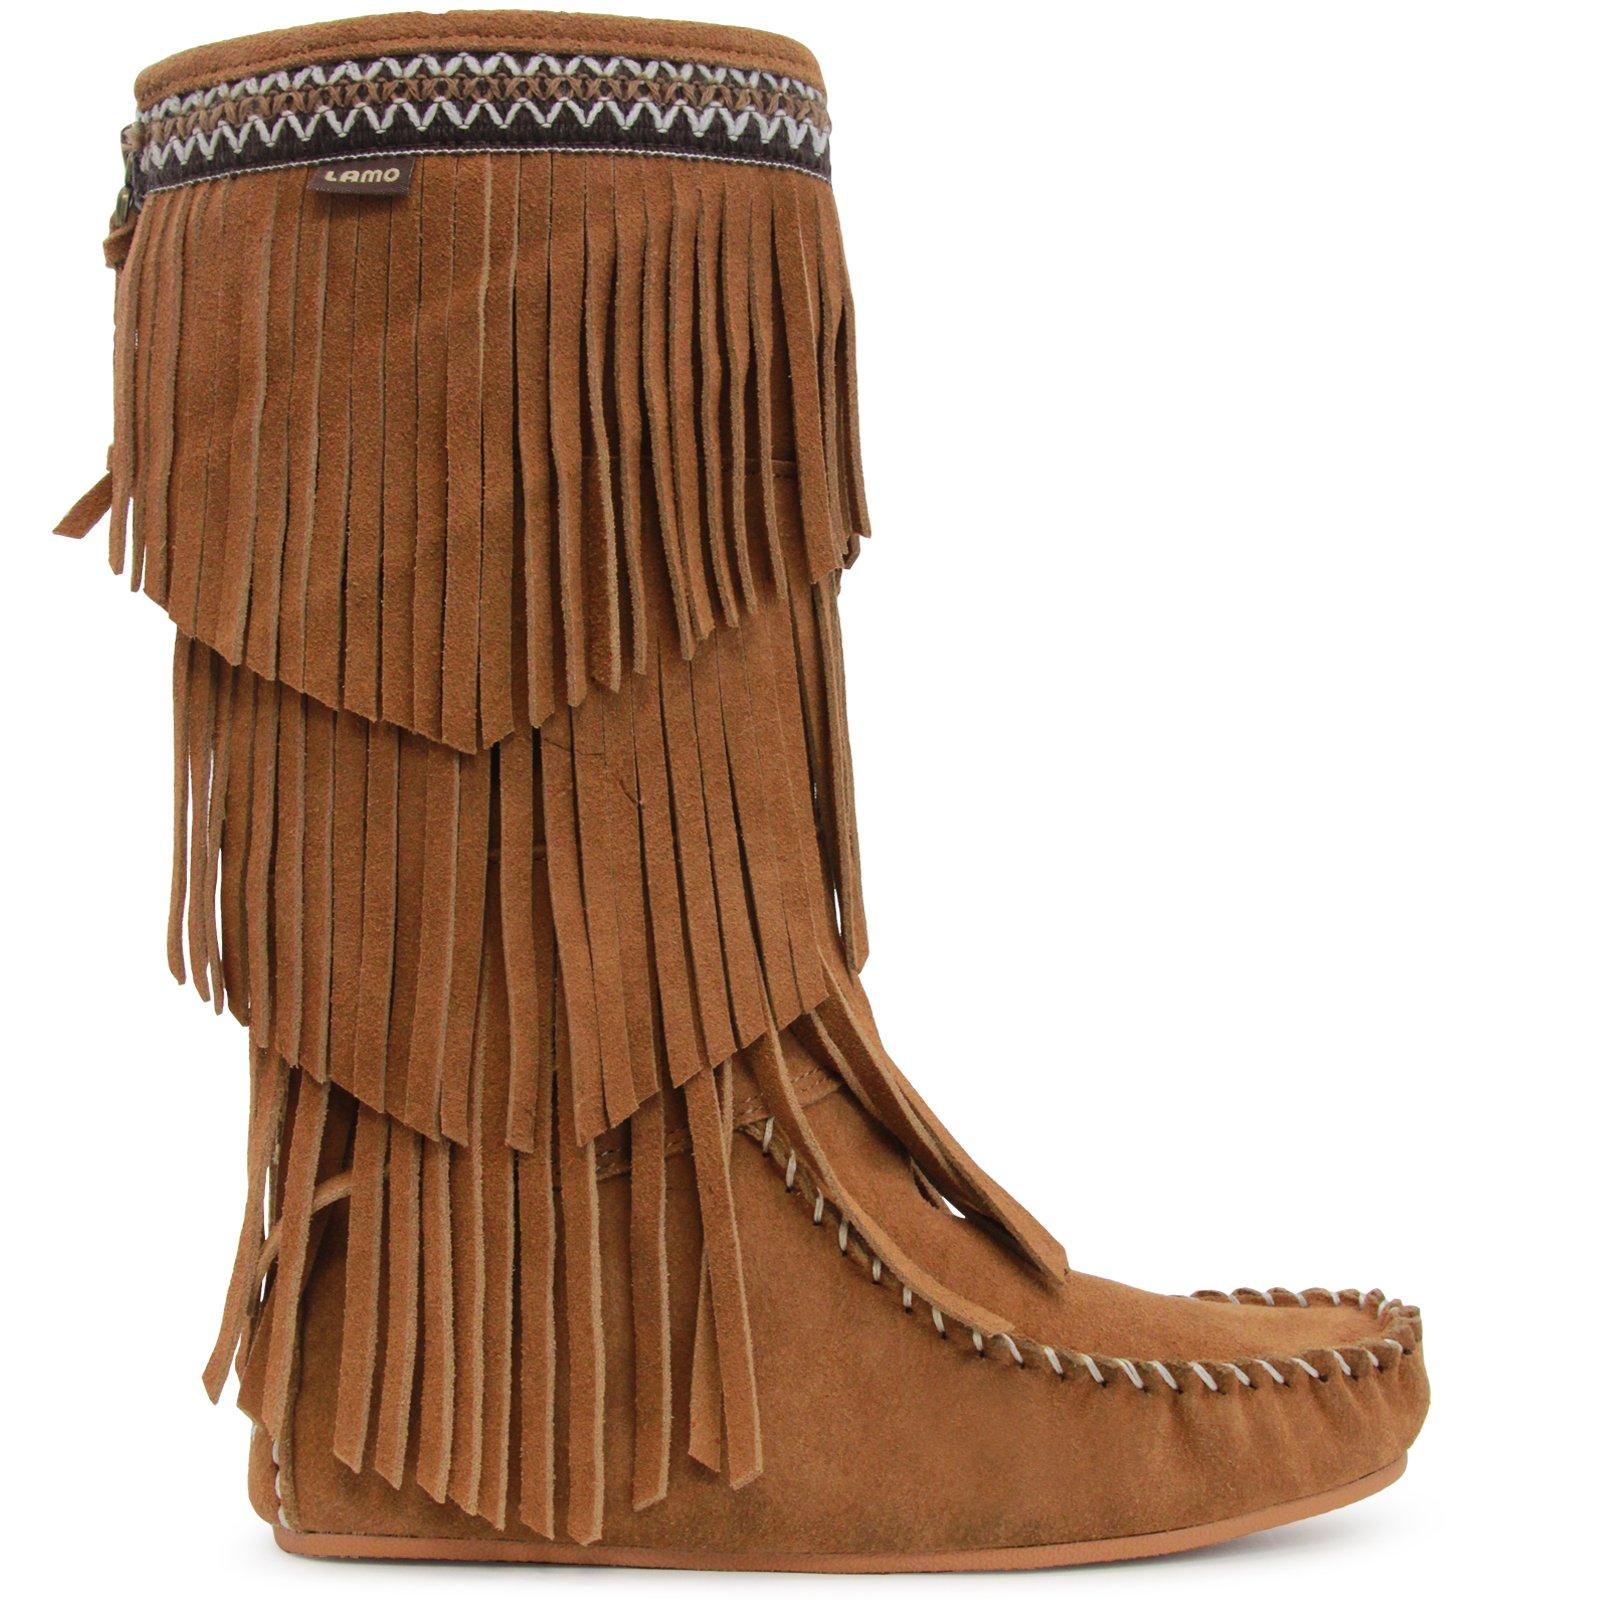 Lamo Women's Virginia Fringe Boot, Slouch Boots Calf -Chestnut, 9 M US